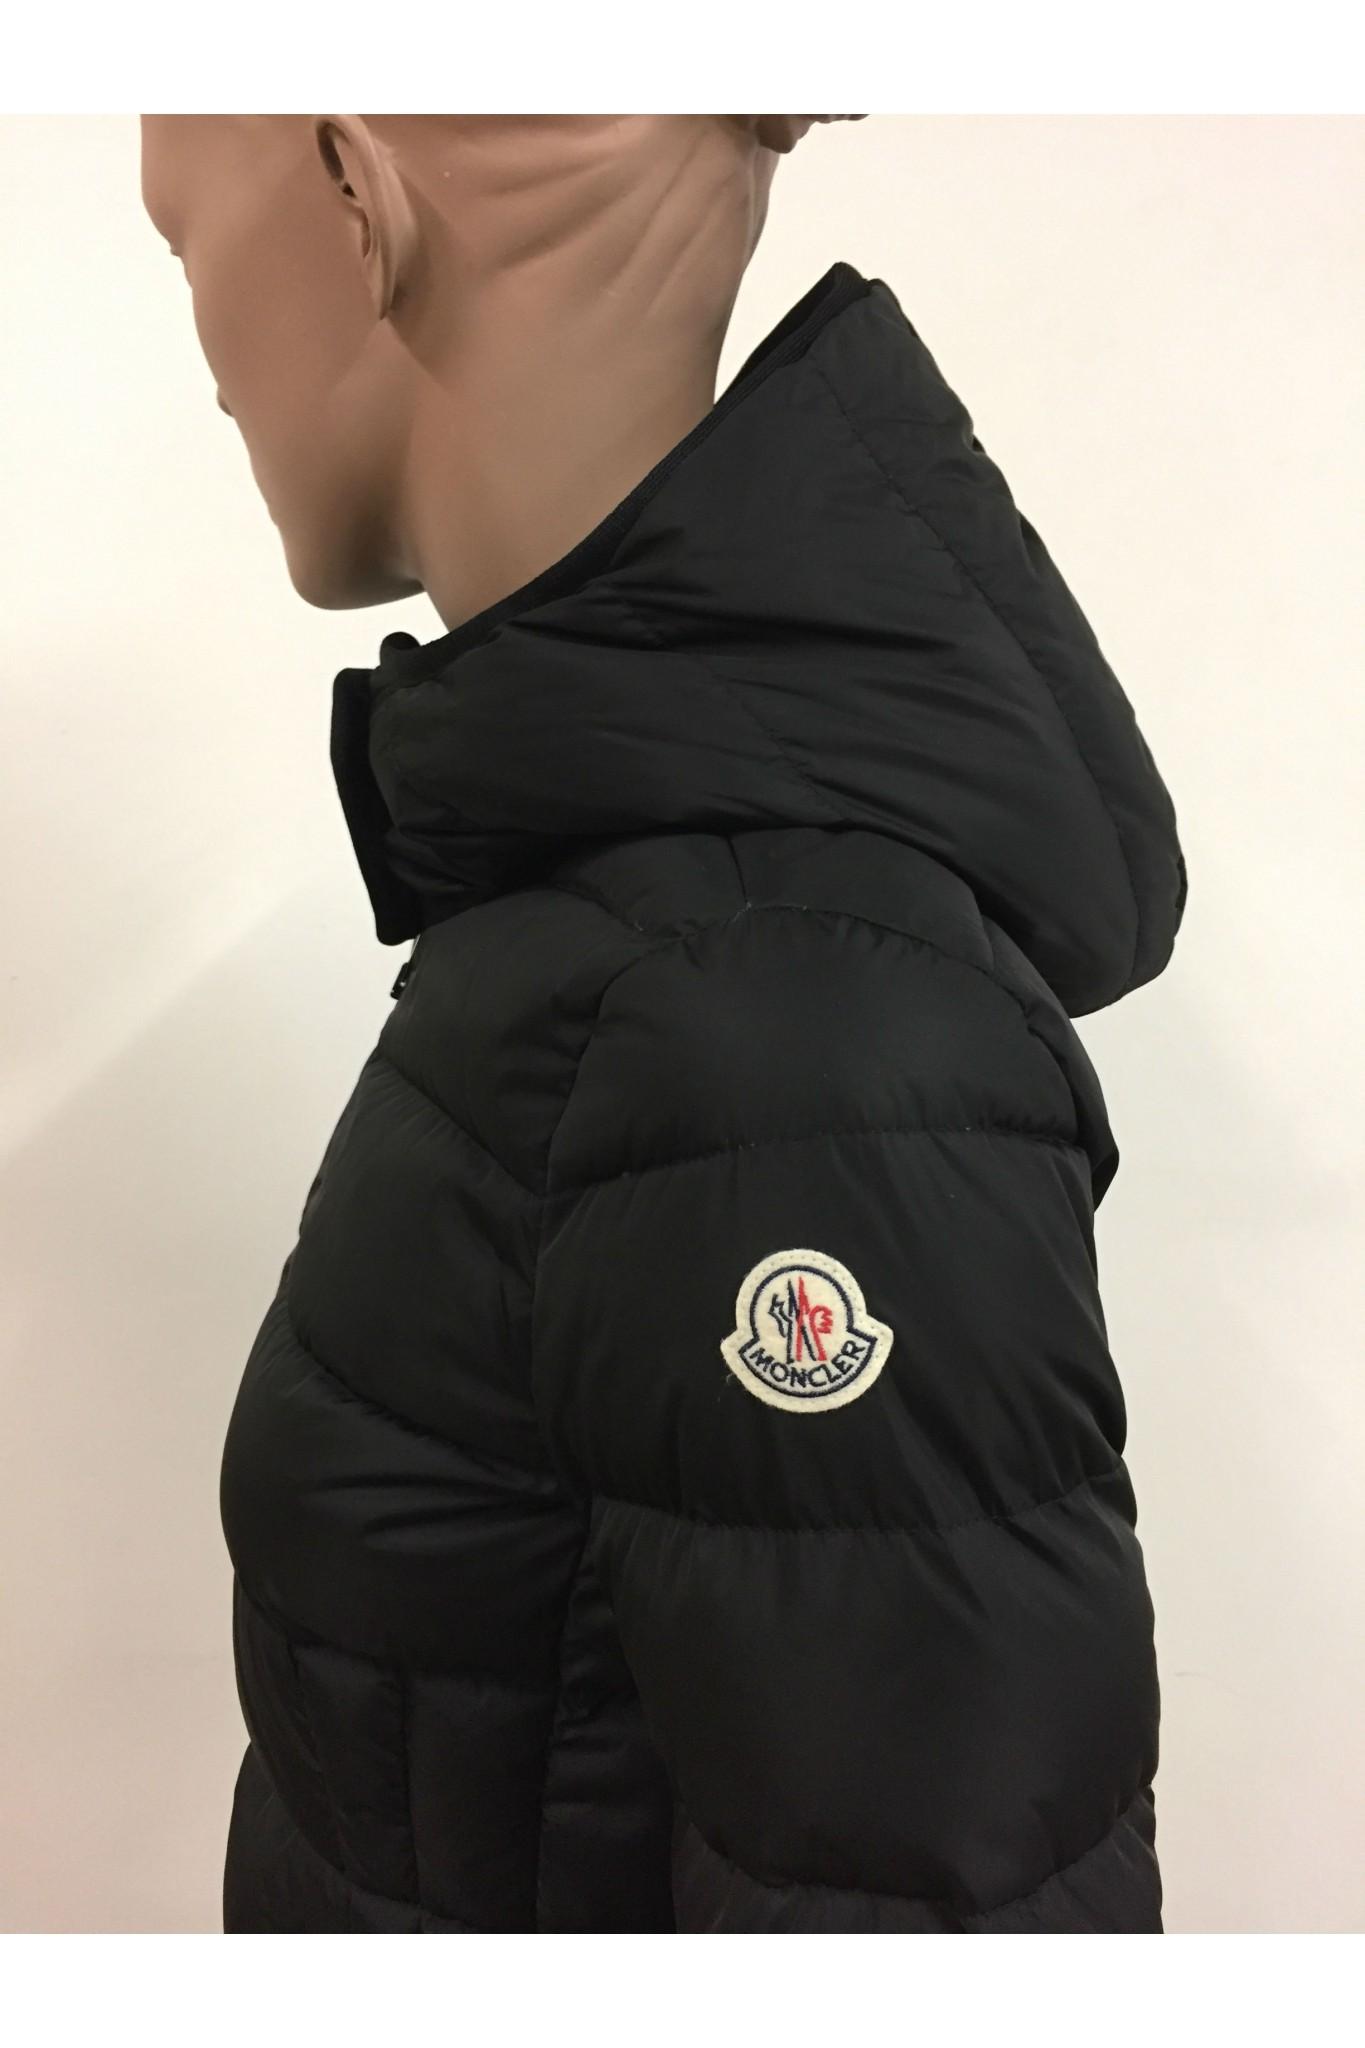 bd1dbaa23 Shop online Moncler down jacket Betula